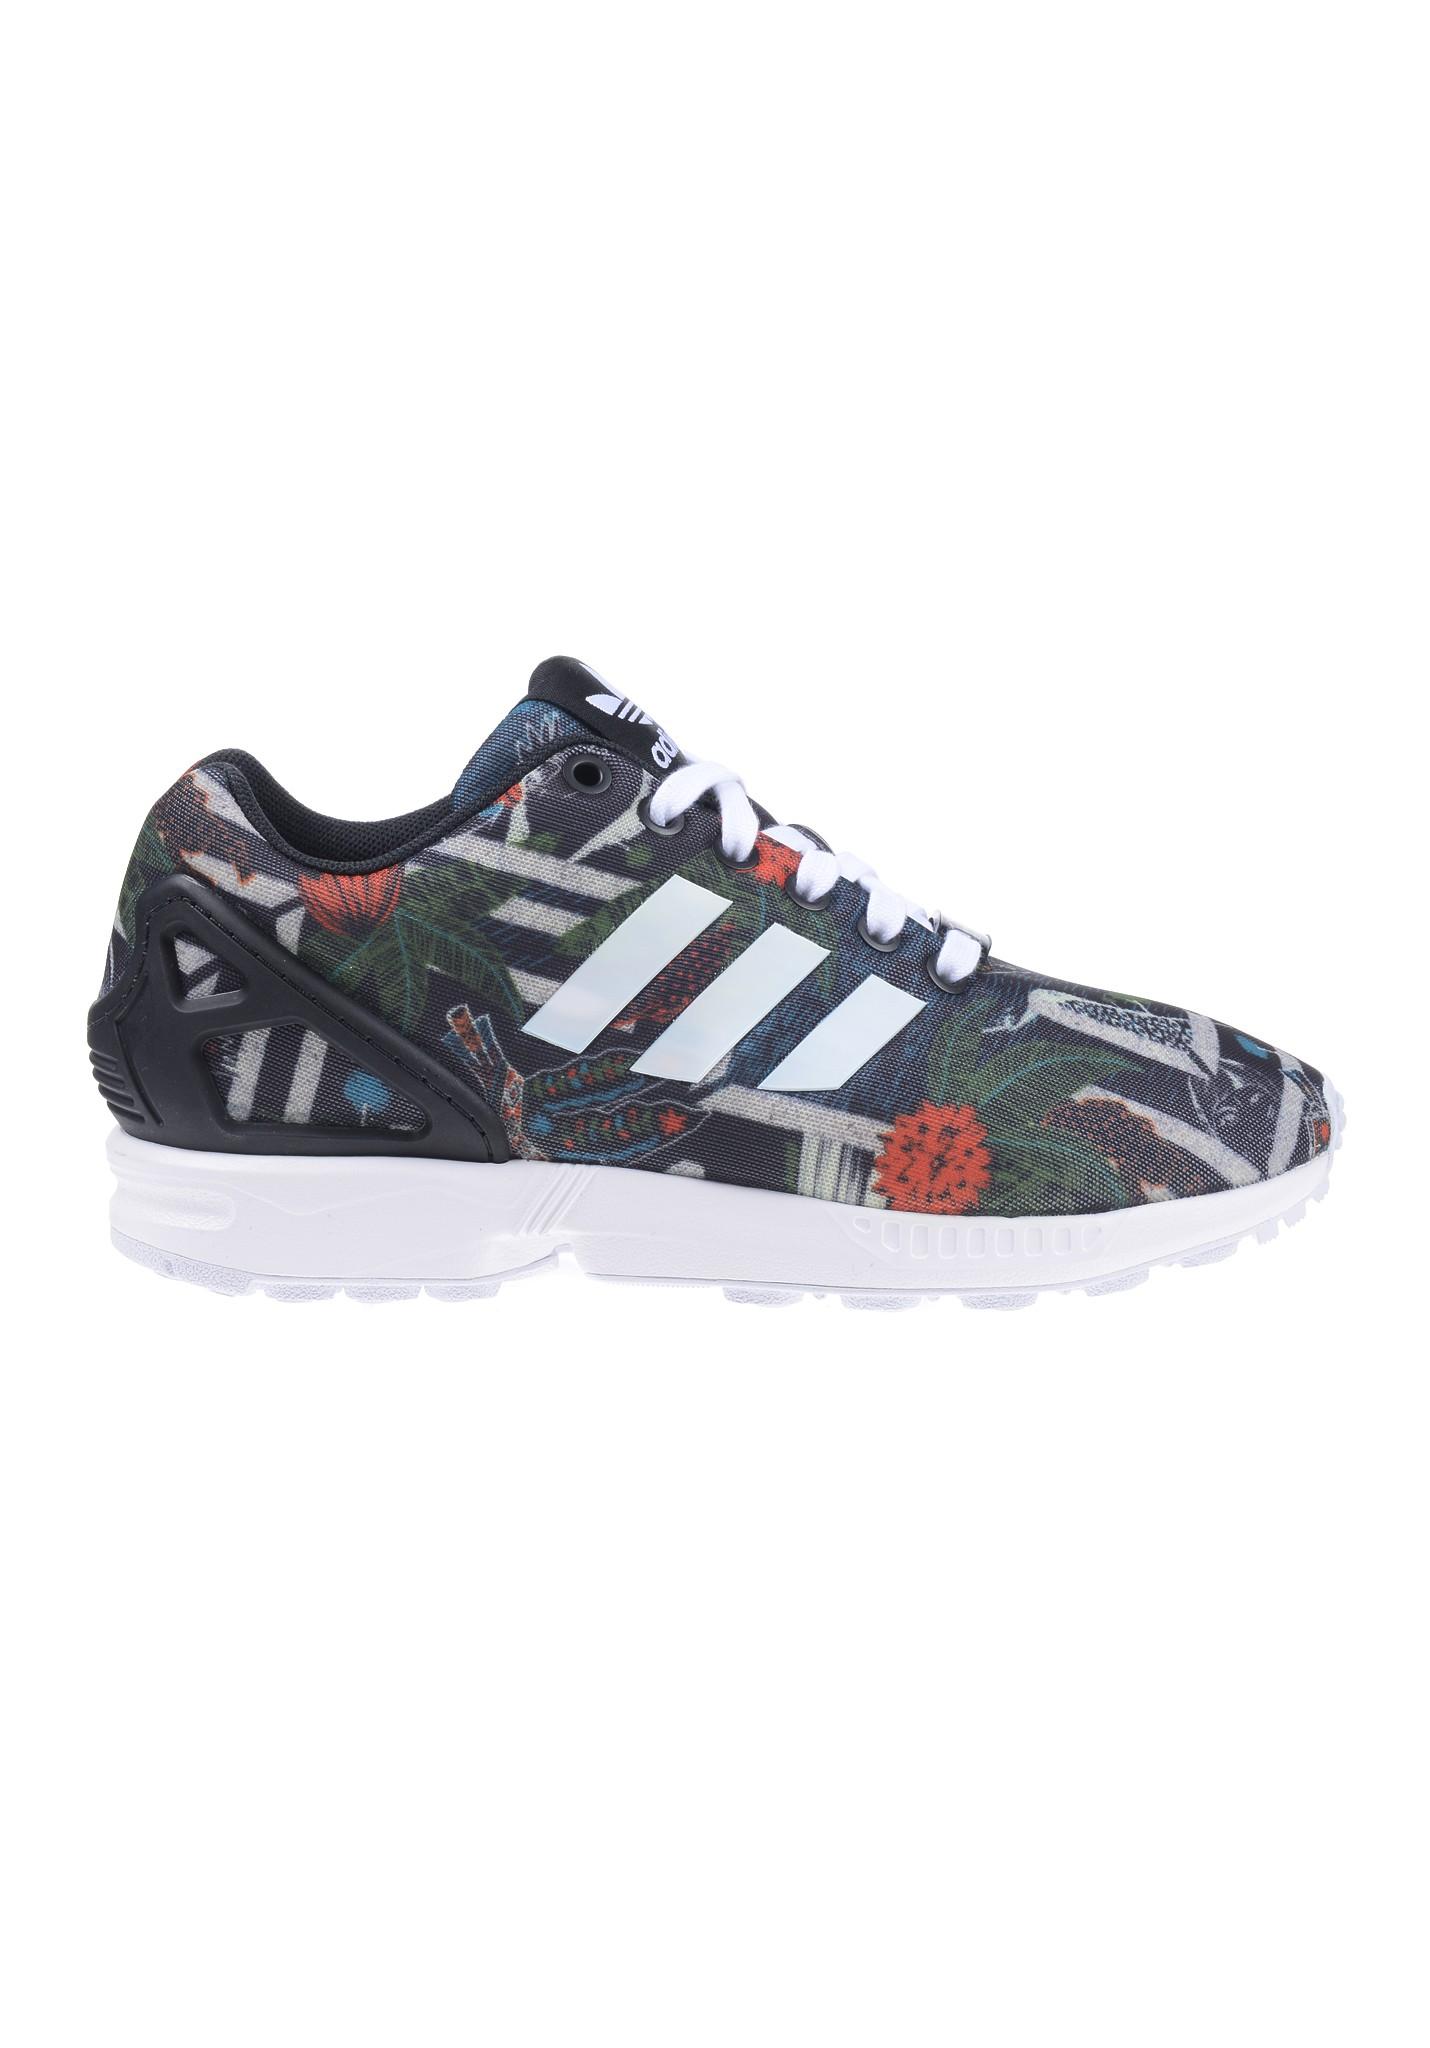 neu adidas zx flux damen sneaker turnschuhe freizeit schuhe sneakers ebay. Black Bedroom Furniture Sets. Home Design Ideas